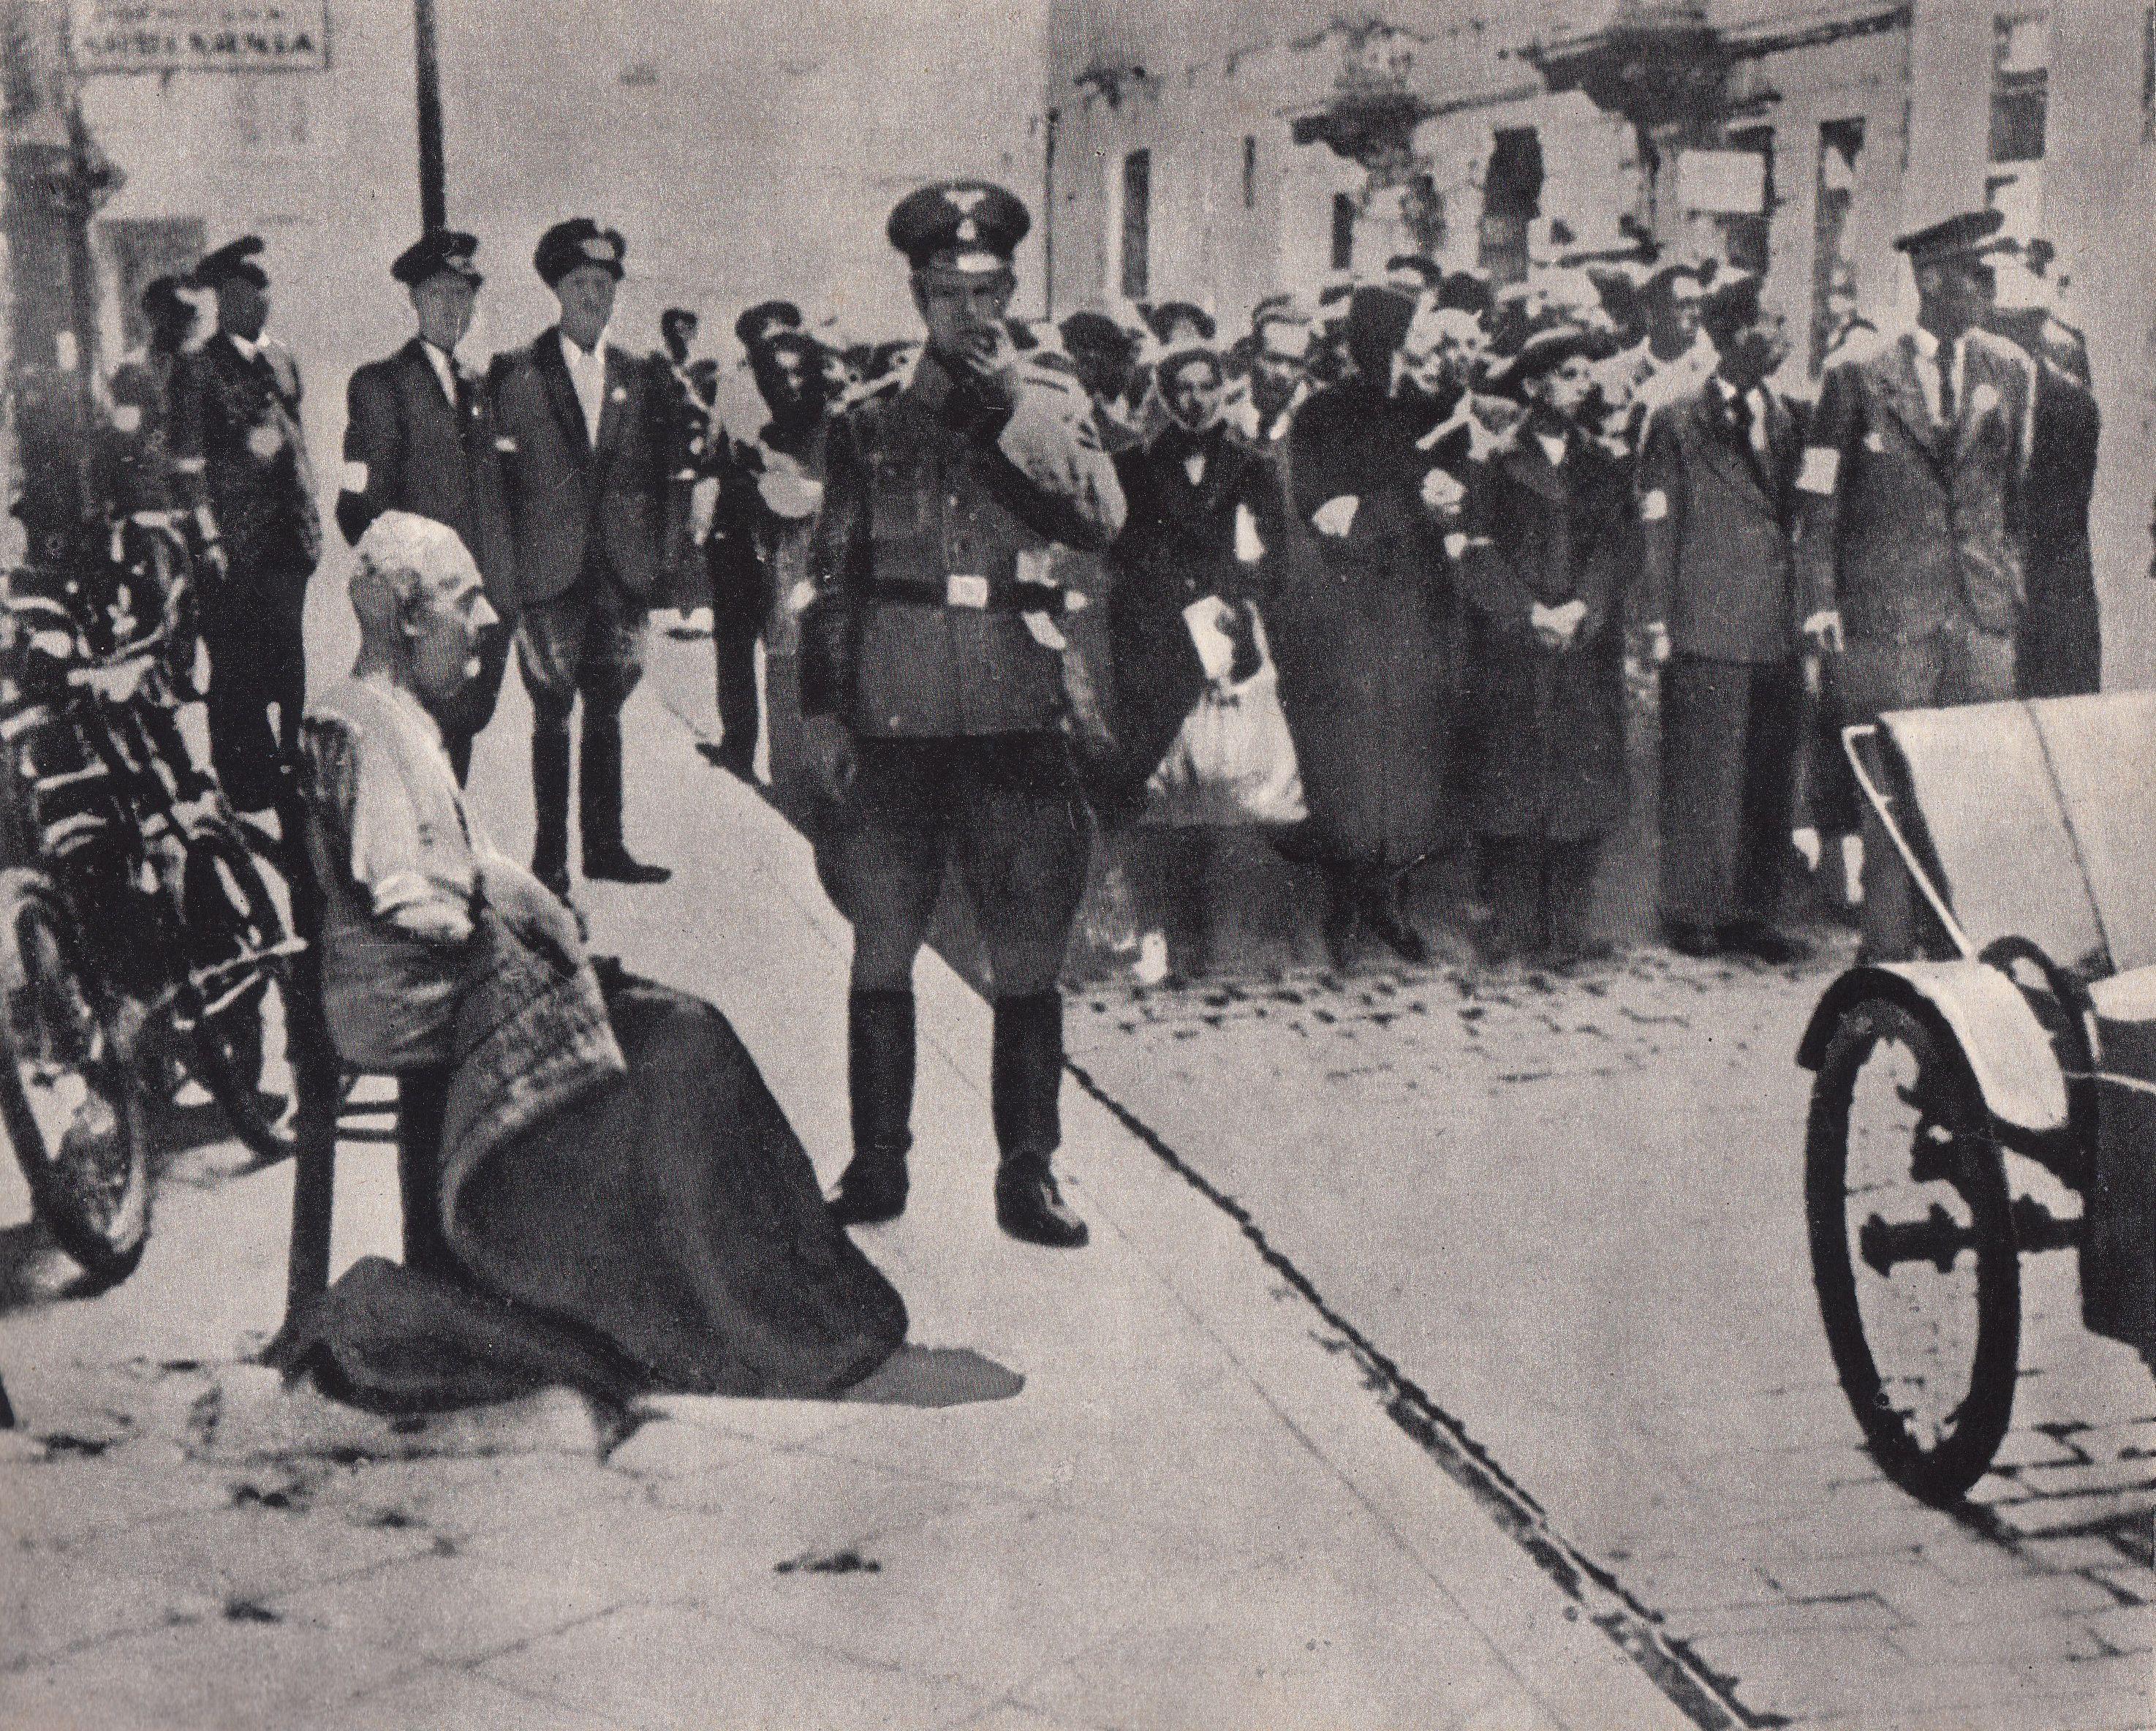 https://upload.wikimedia.org/wikipedia/commons/2/2f/Grossaktion_Warsaw_1942.jpg